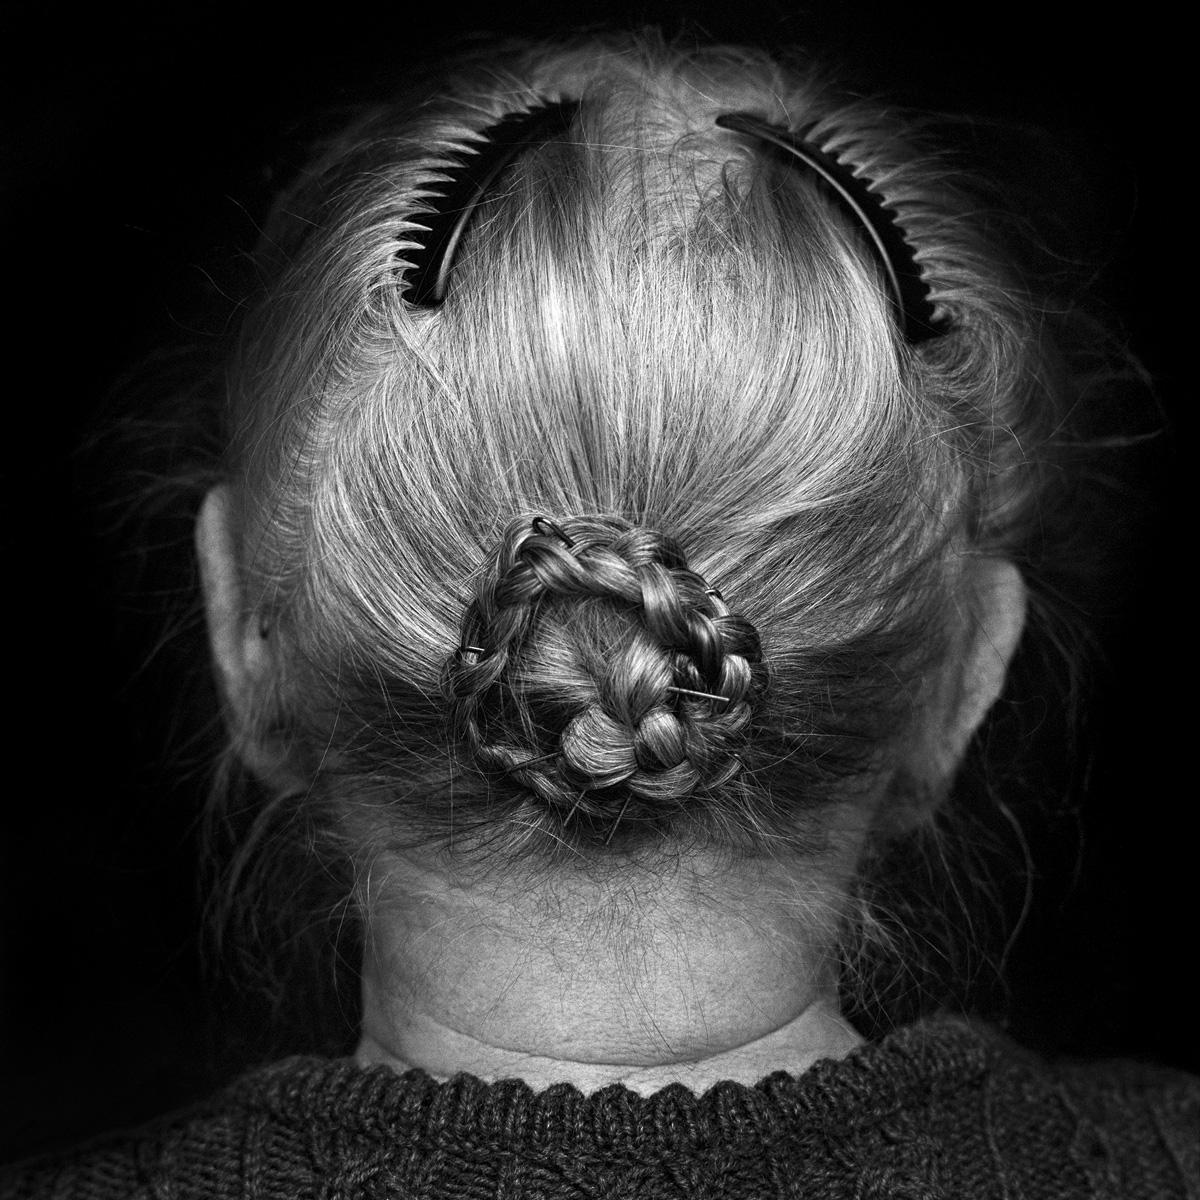 © Christine Turnauer - Maria, farmer, Attersee, Austria, 1996, Coal pigment print